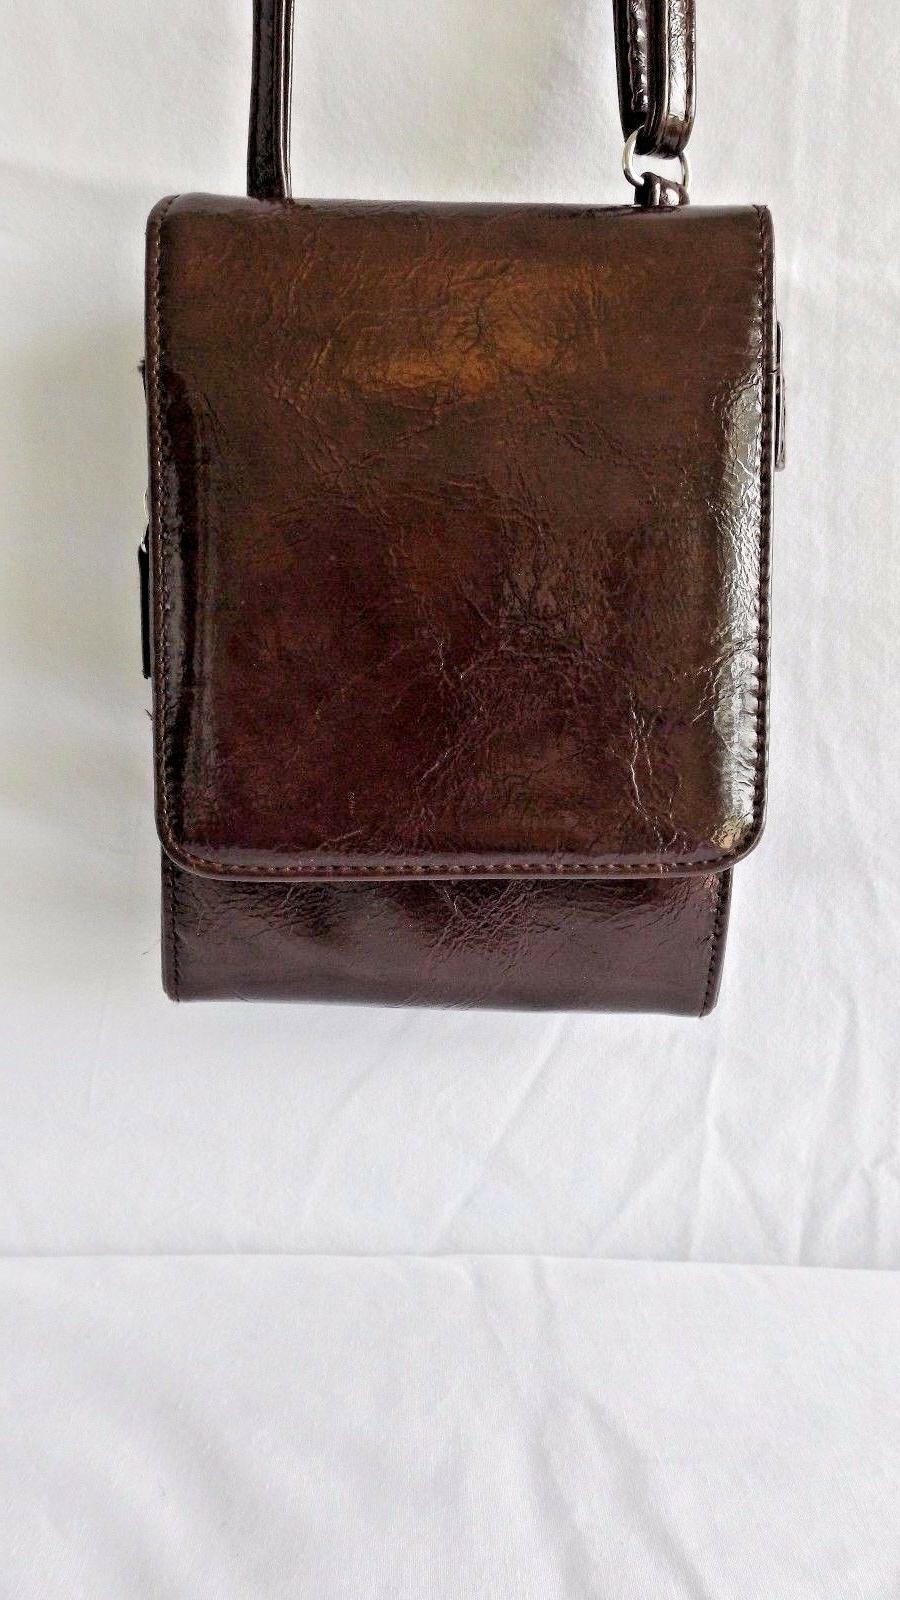 Mundi Body Bag, Brown Faux Leather, NWOTS